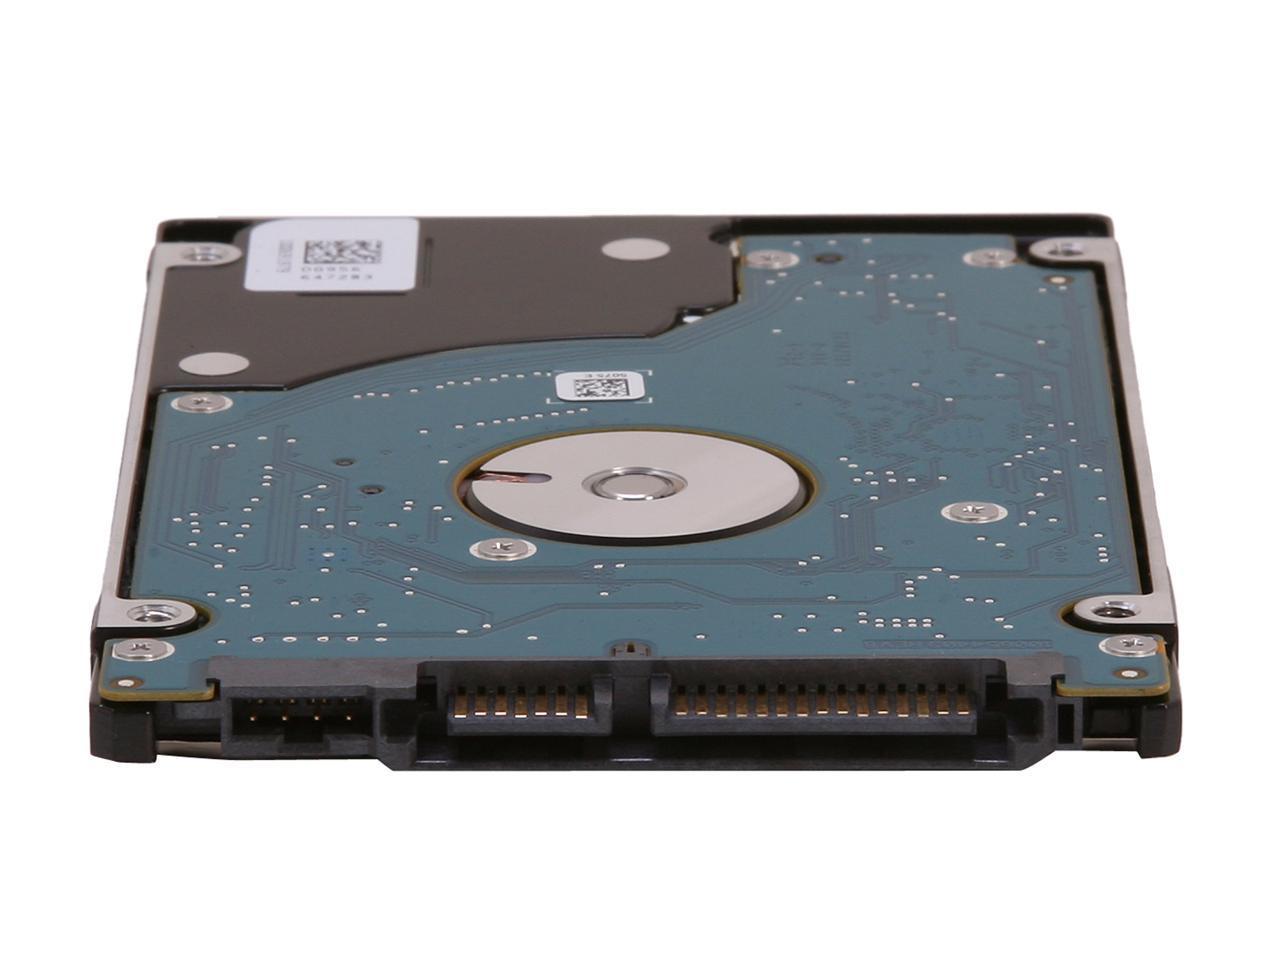 Seagate Momentus Thin ST320LT012 320GB 5400 RPM RPM 16MB